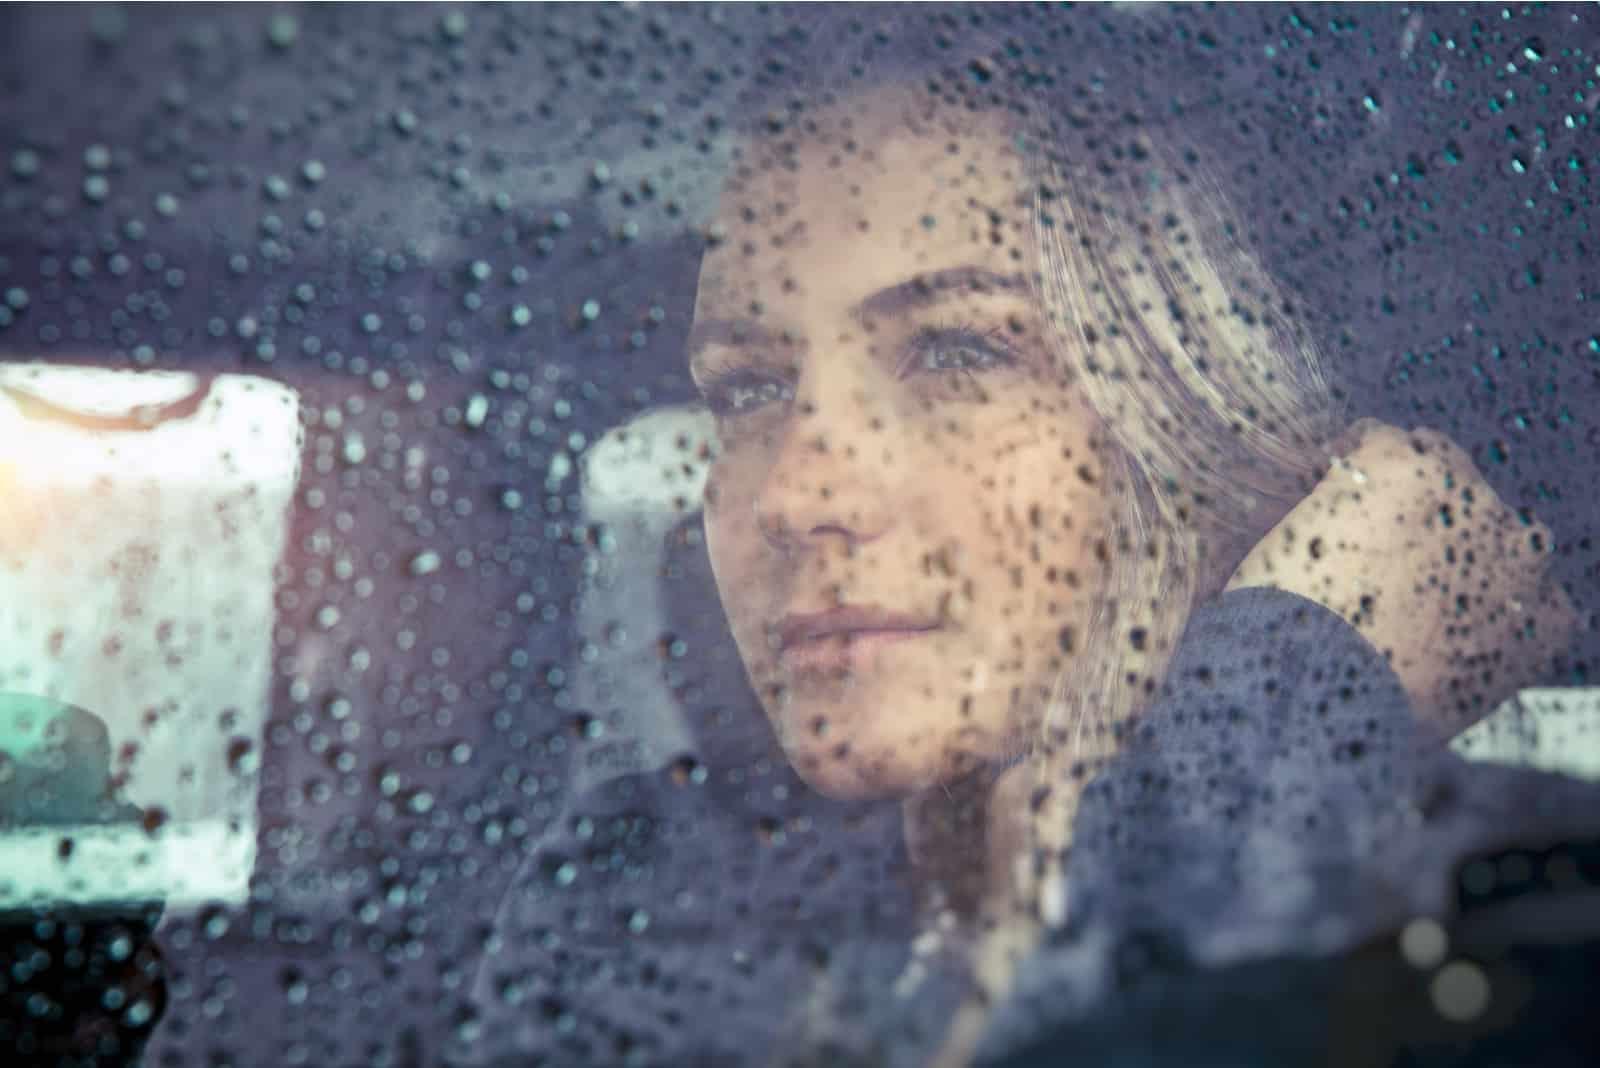 belle femme triste assise dans la voiture